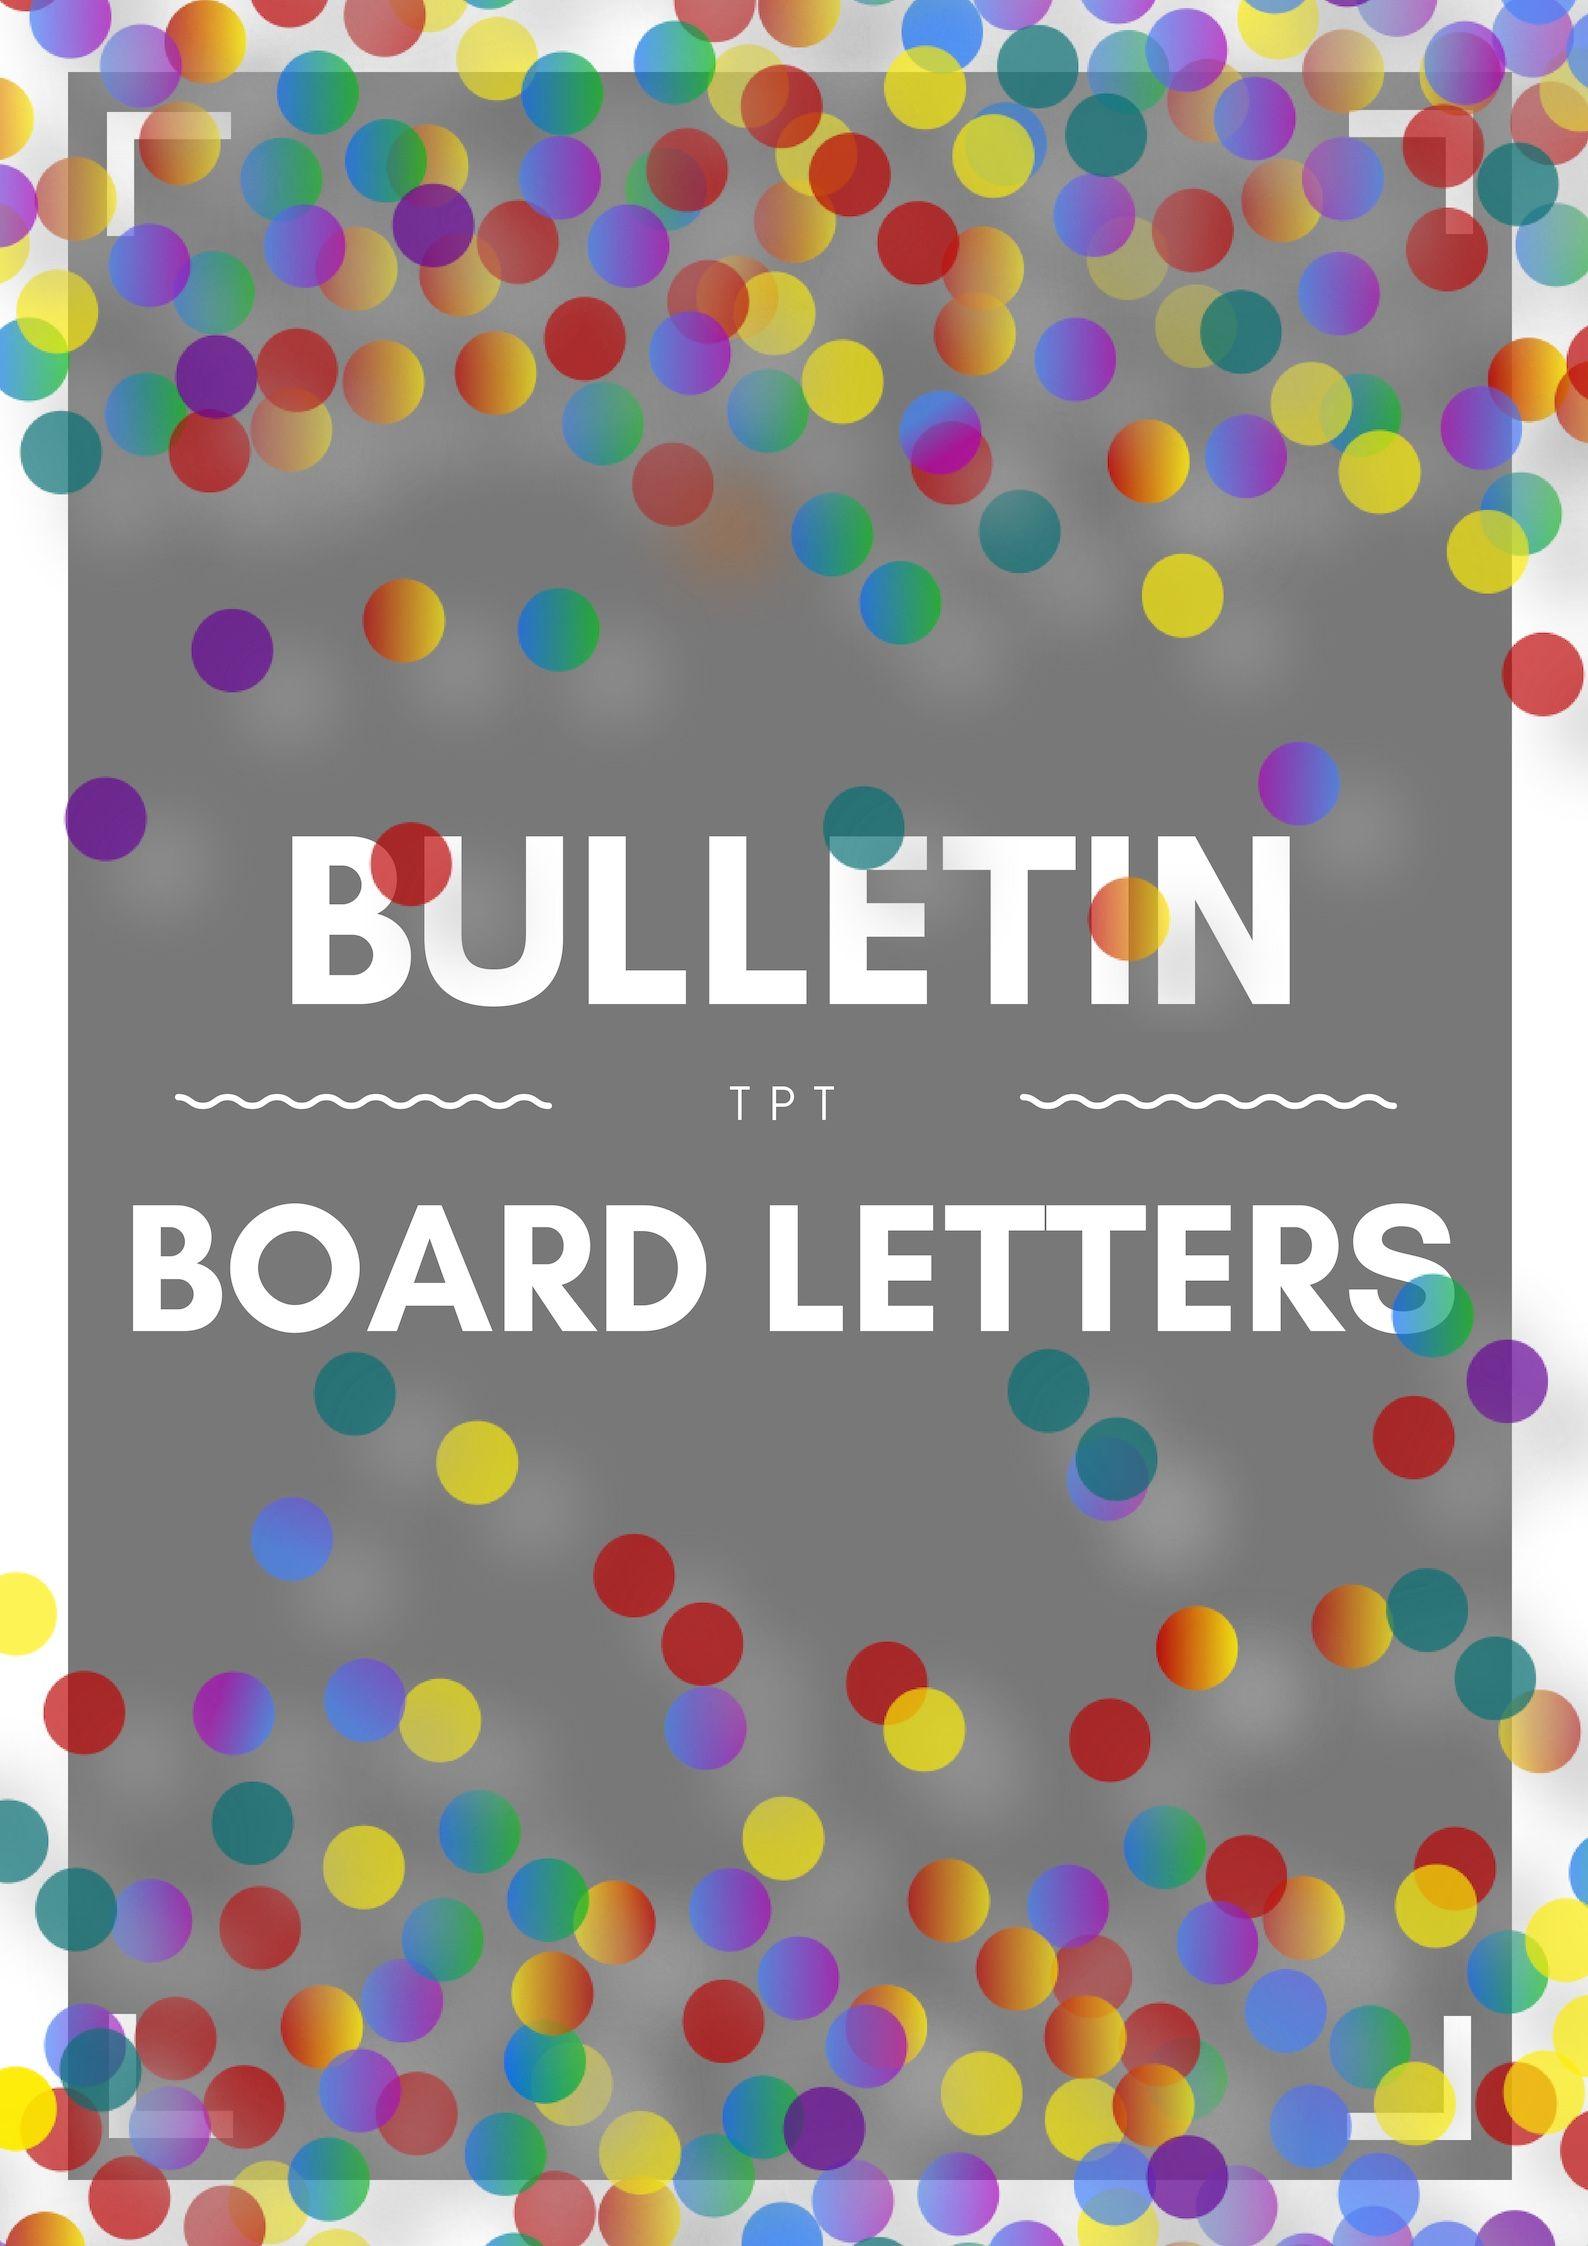 Bulletin board letters bulletin board letters lettering